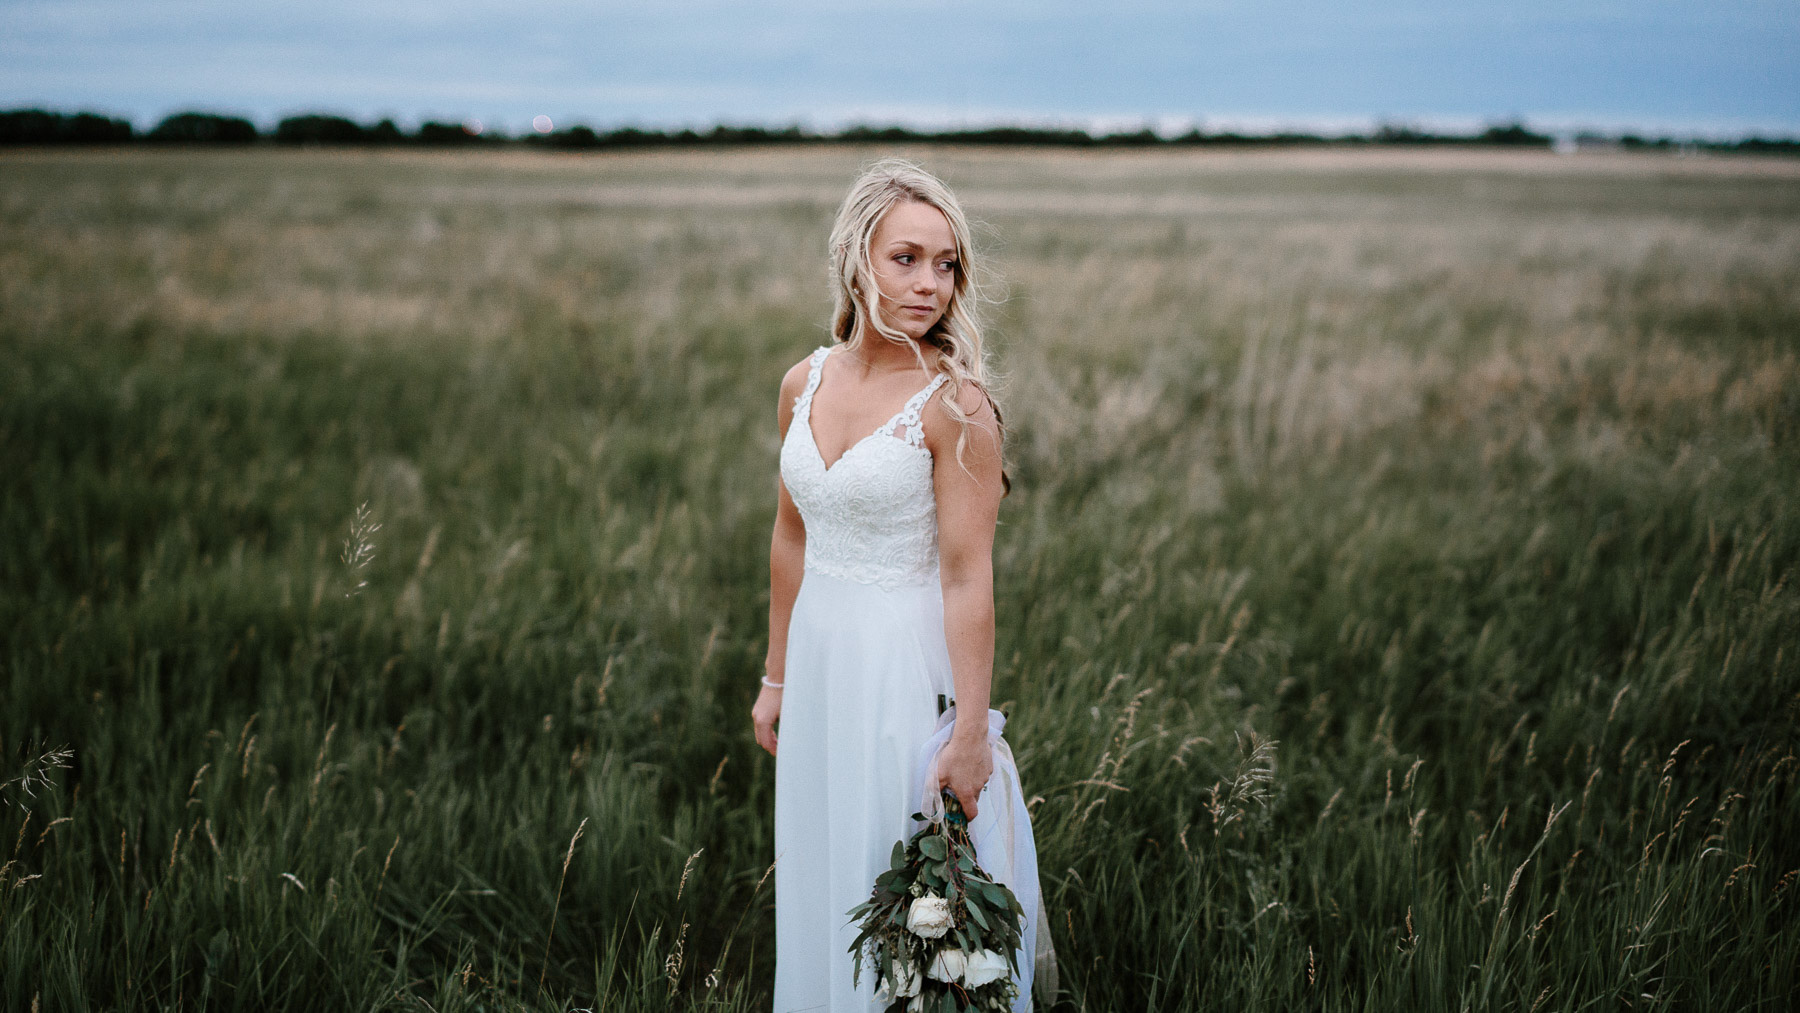 Intimate_Farmhouse_SD_Wedding_Bridgette_Philip_073.jpg